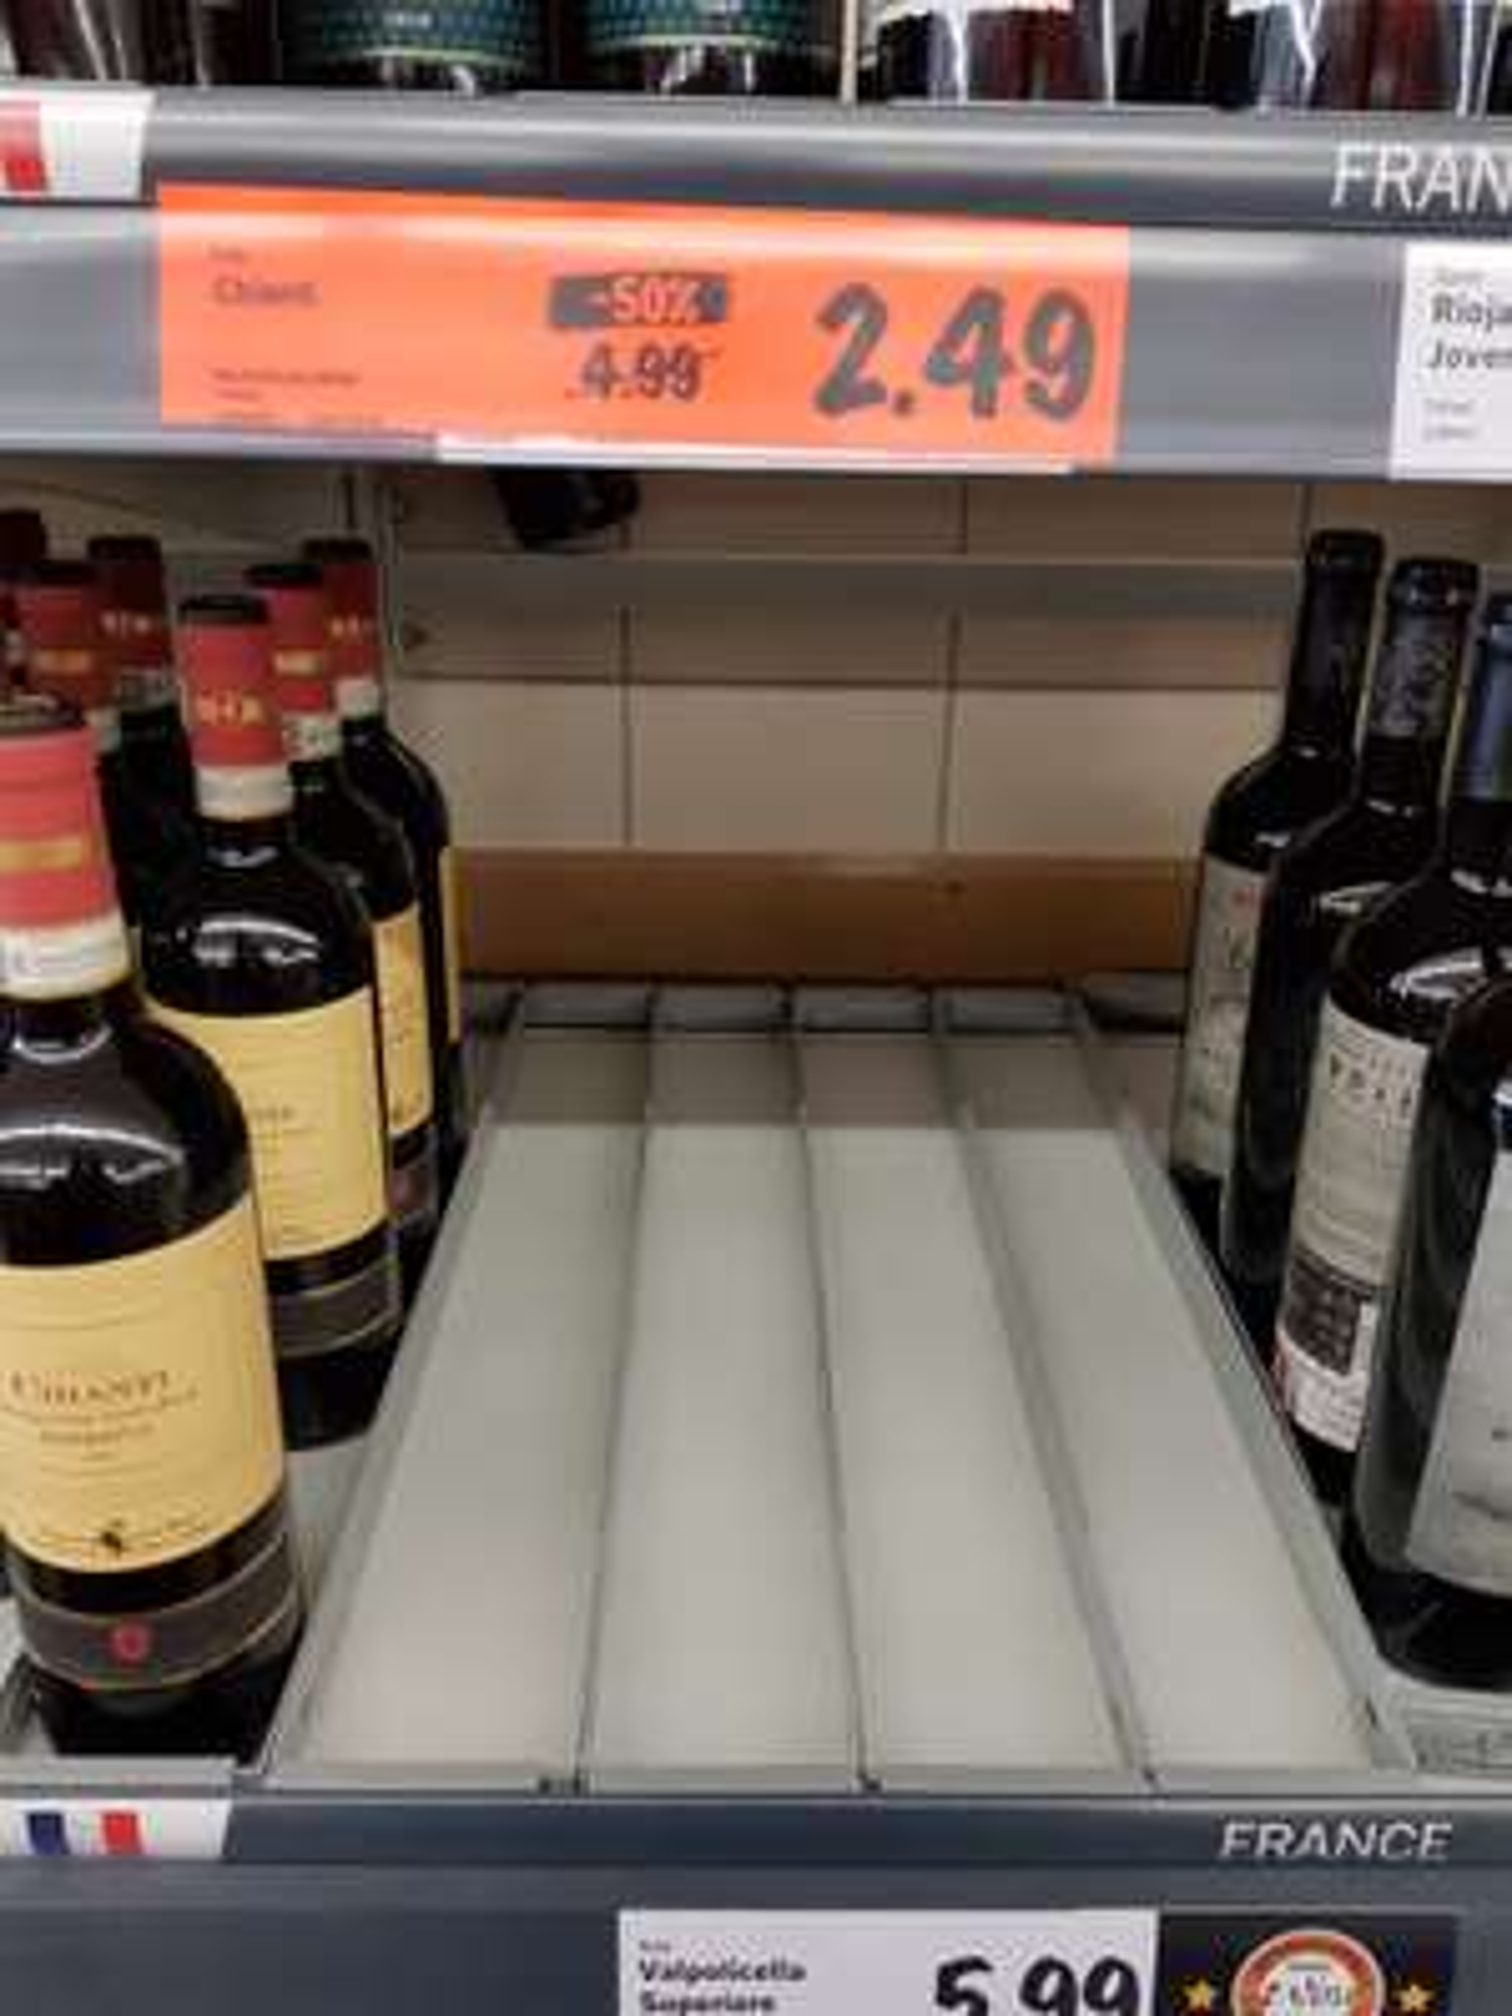 Lidl chianti half price £2.49